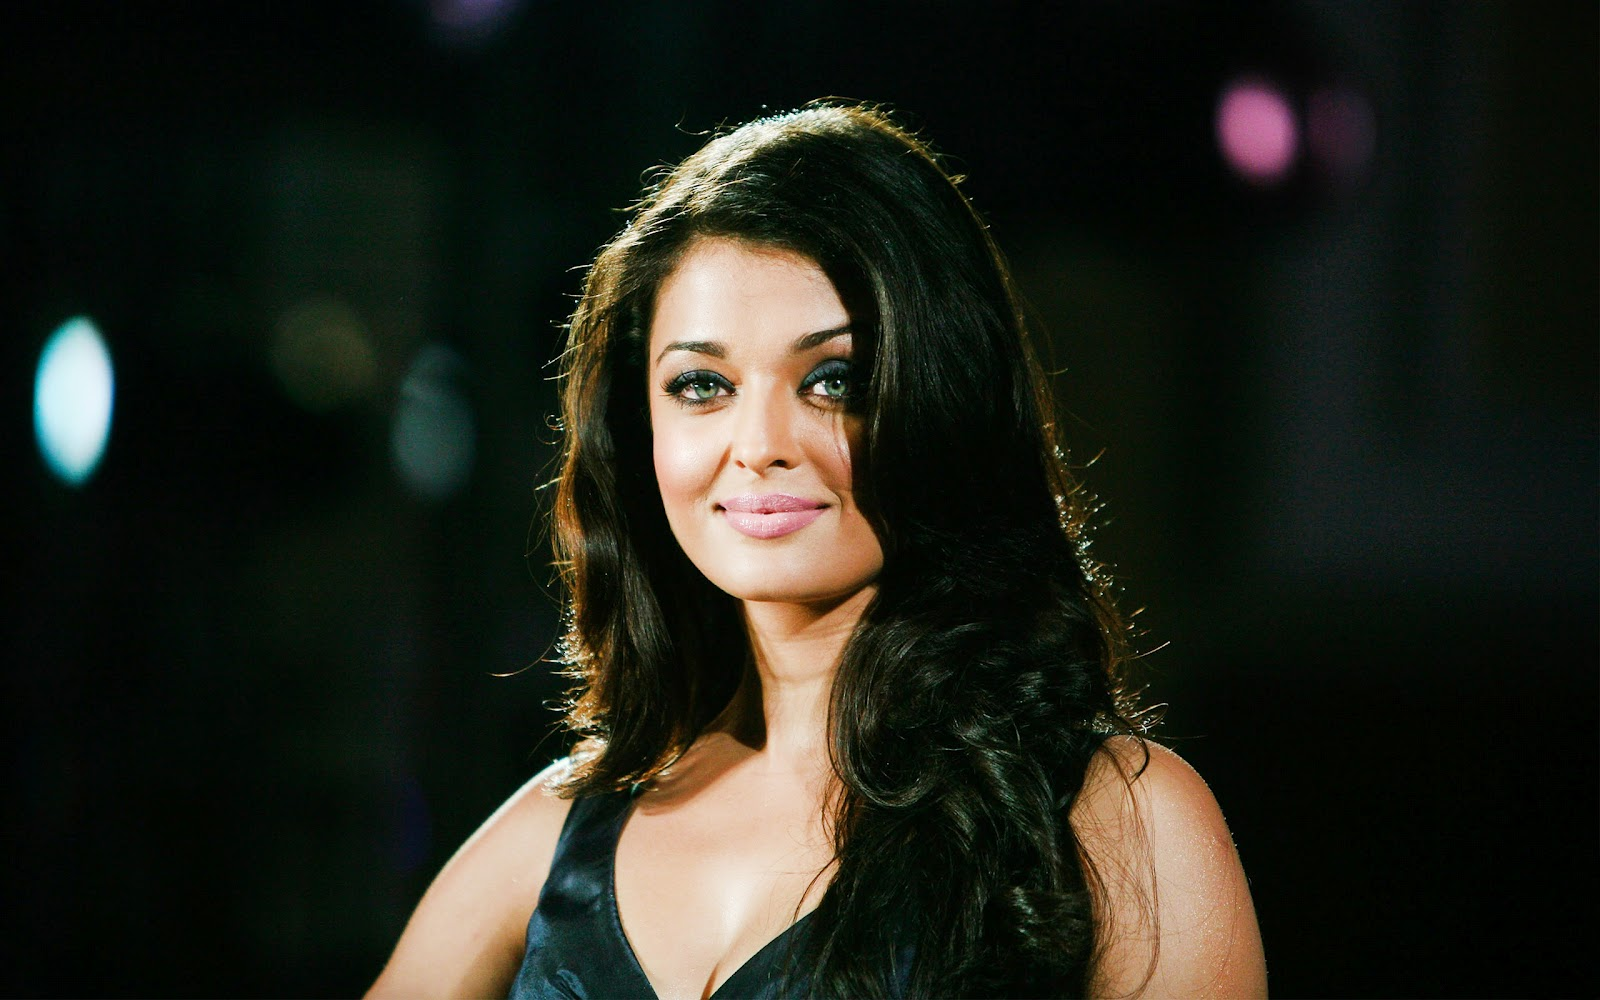 Wallpaper india indian actresses hd wallpapers - Indian beautiful models hd wallpapers ...